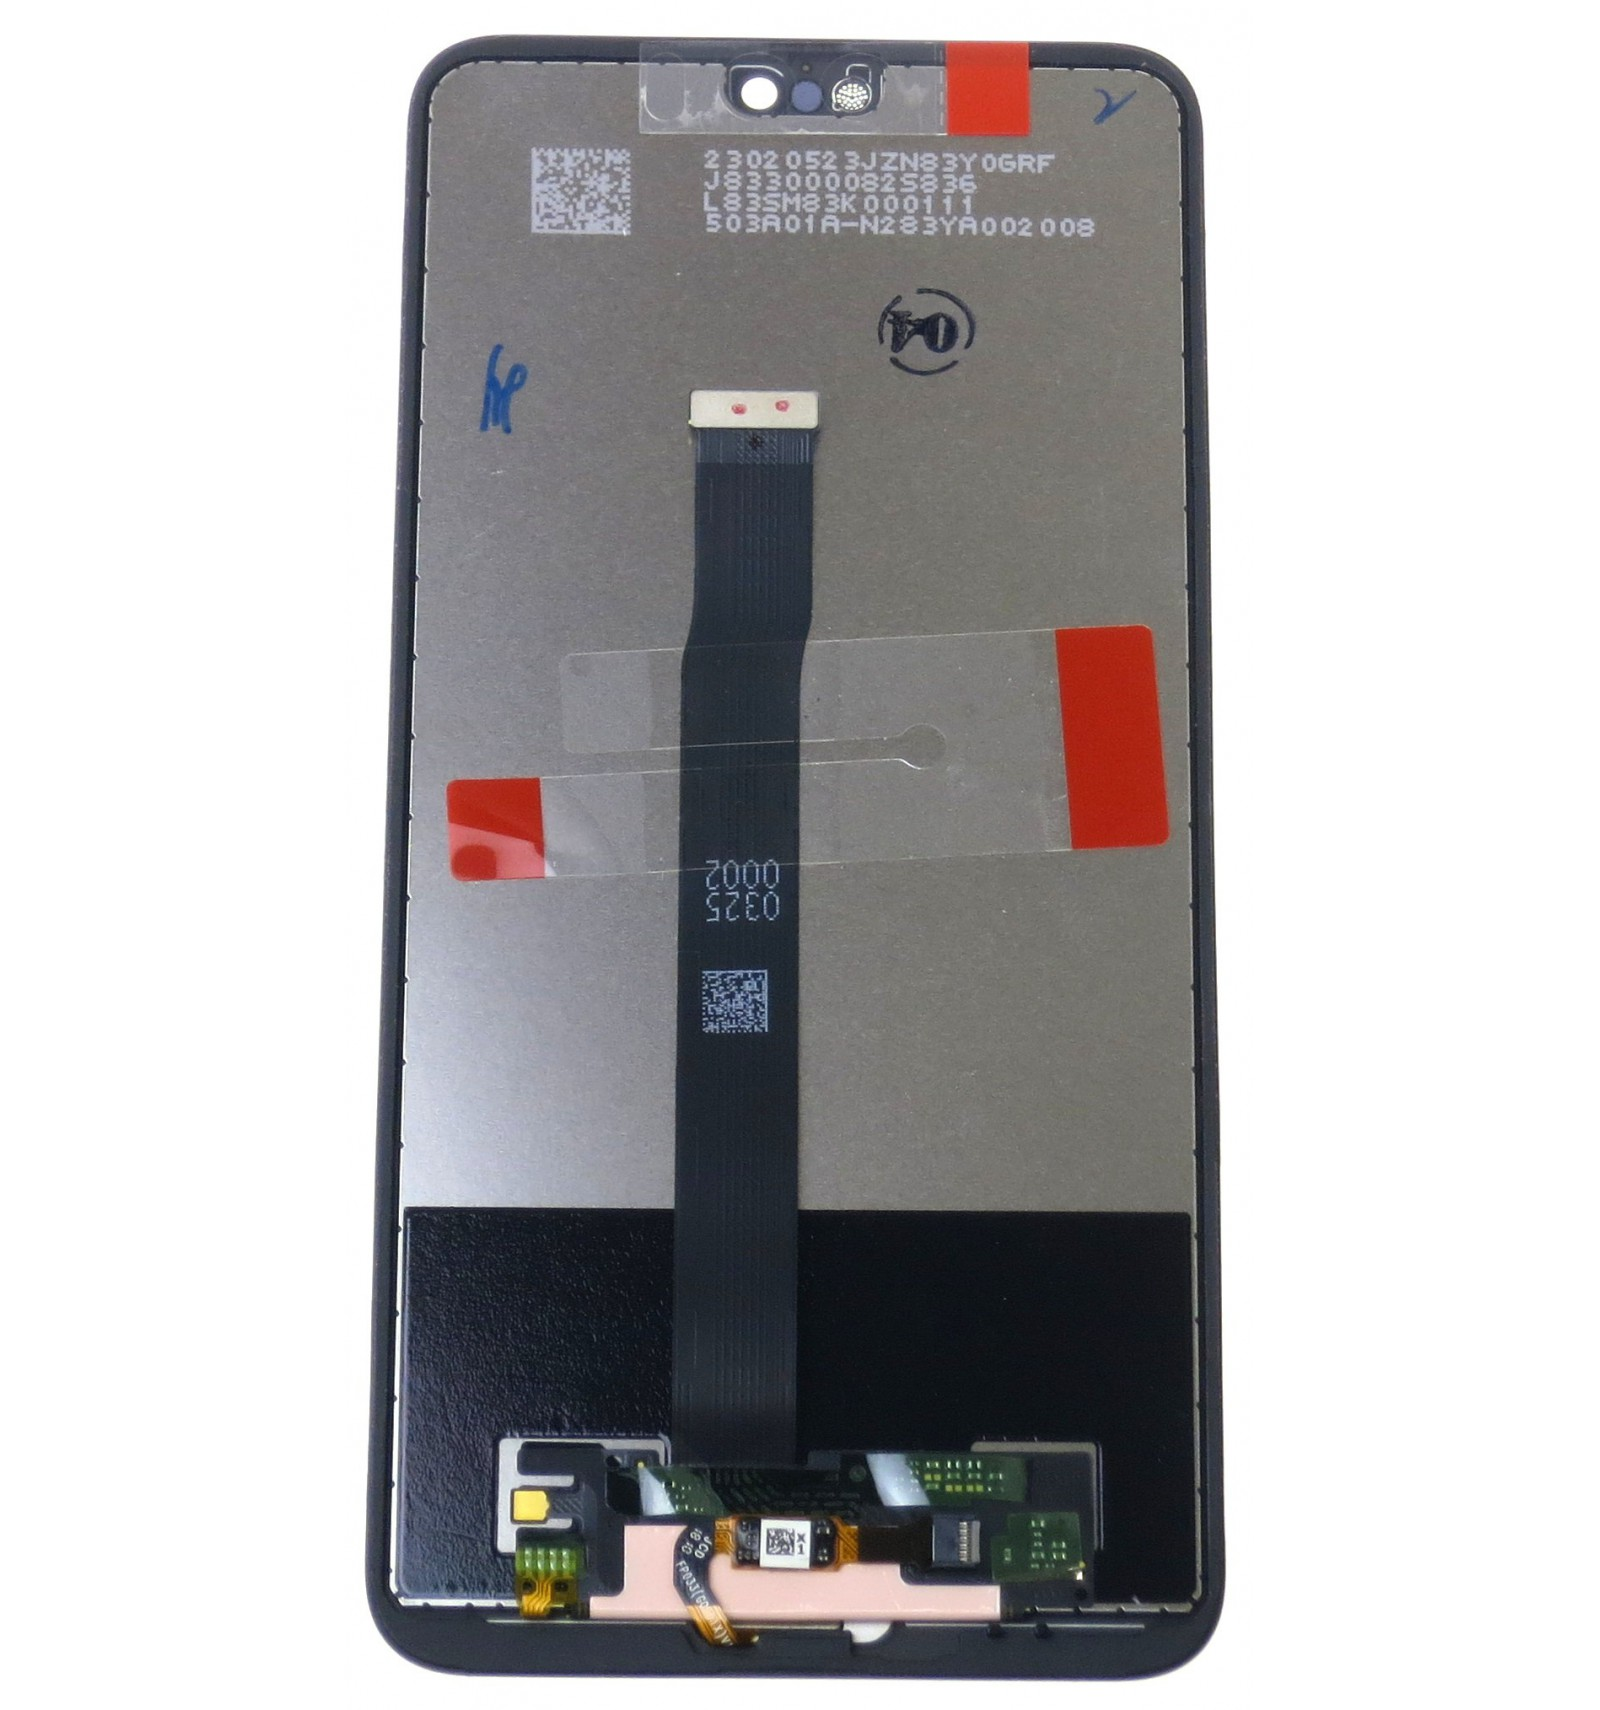 Lcd Touch Screen Frame Small Parts Black Original For Huawei Touchscreen Plus Xiaomi Redmi 3 3s 3x 3pro P20 Displej Dotykov Plocha Rm Mal Diely Ierna Originl